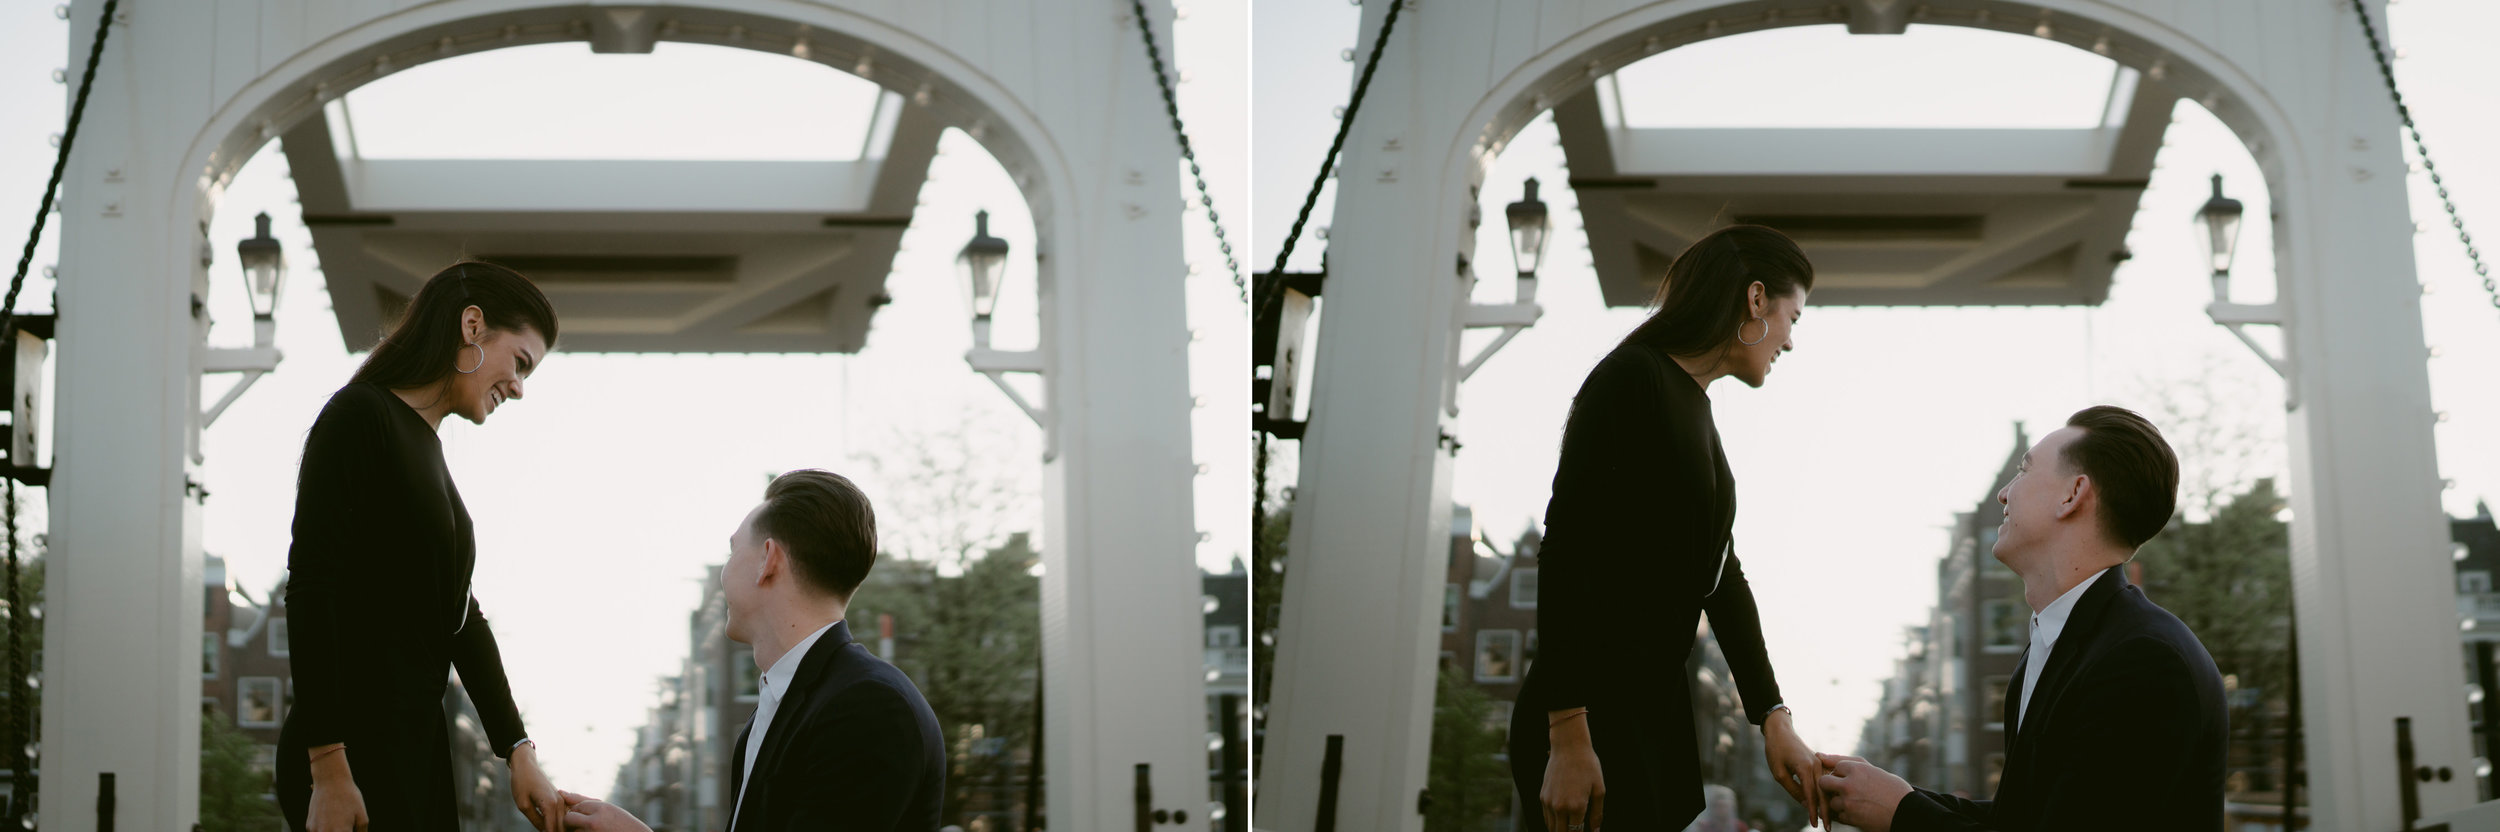 bruidsfotografie-amsterdam-utrecht-trouwfotograaf-mark-hadden-wedding-photography-ross - alexa-040 copy 2.jpg